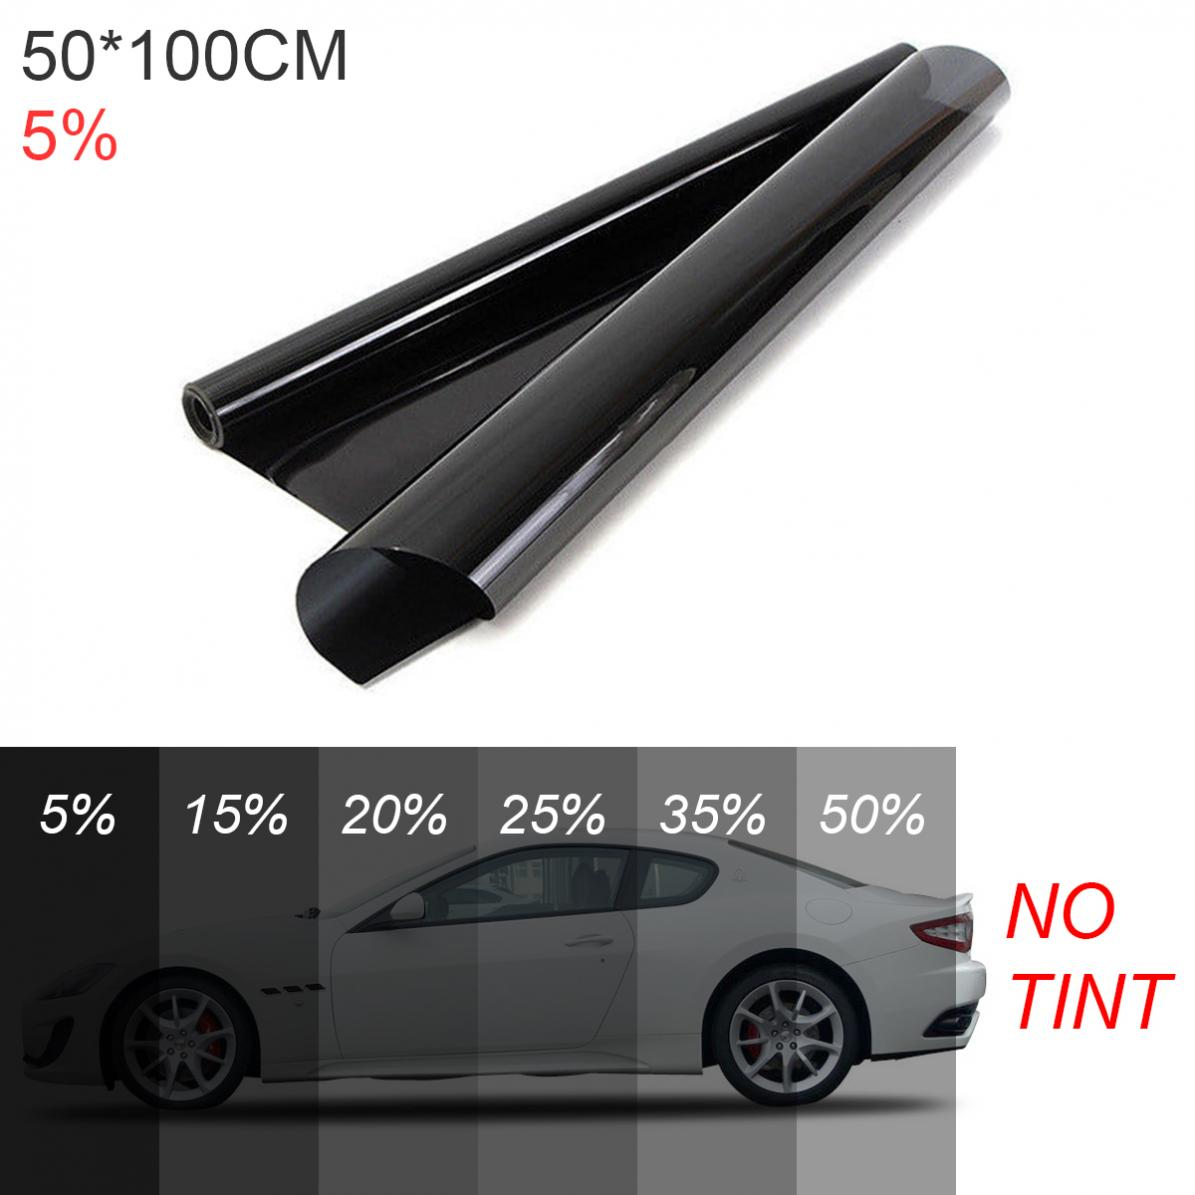 PVC 50 x 100CM Thickening Anti-wear Car Curtain Windshield Sun Shade UV Protection Side Window Film VLT Solar Sticker